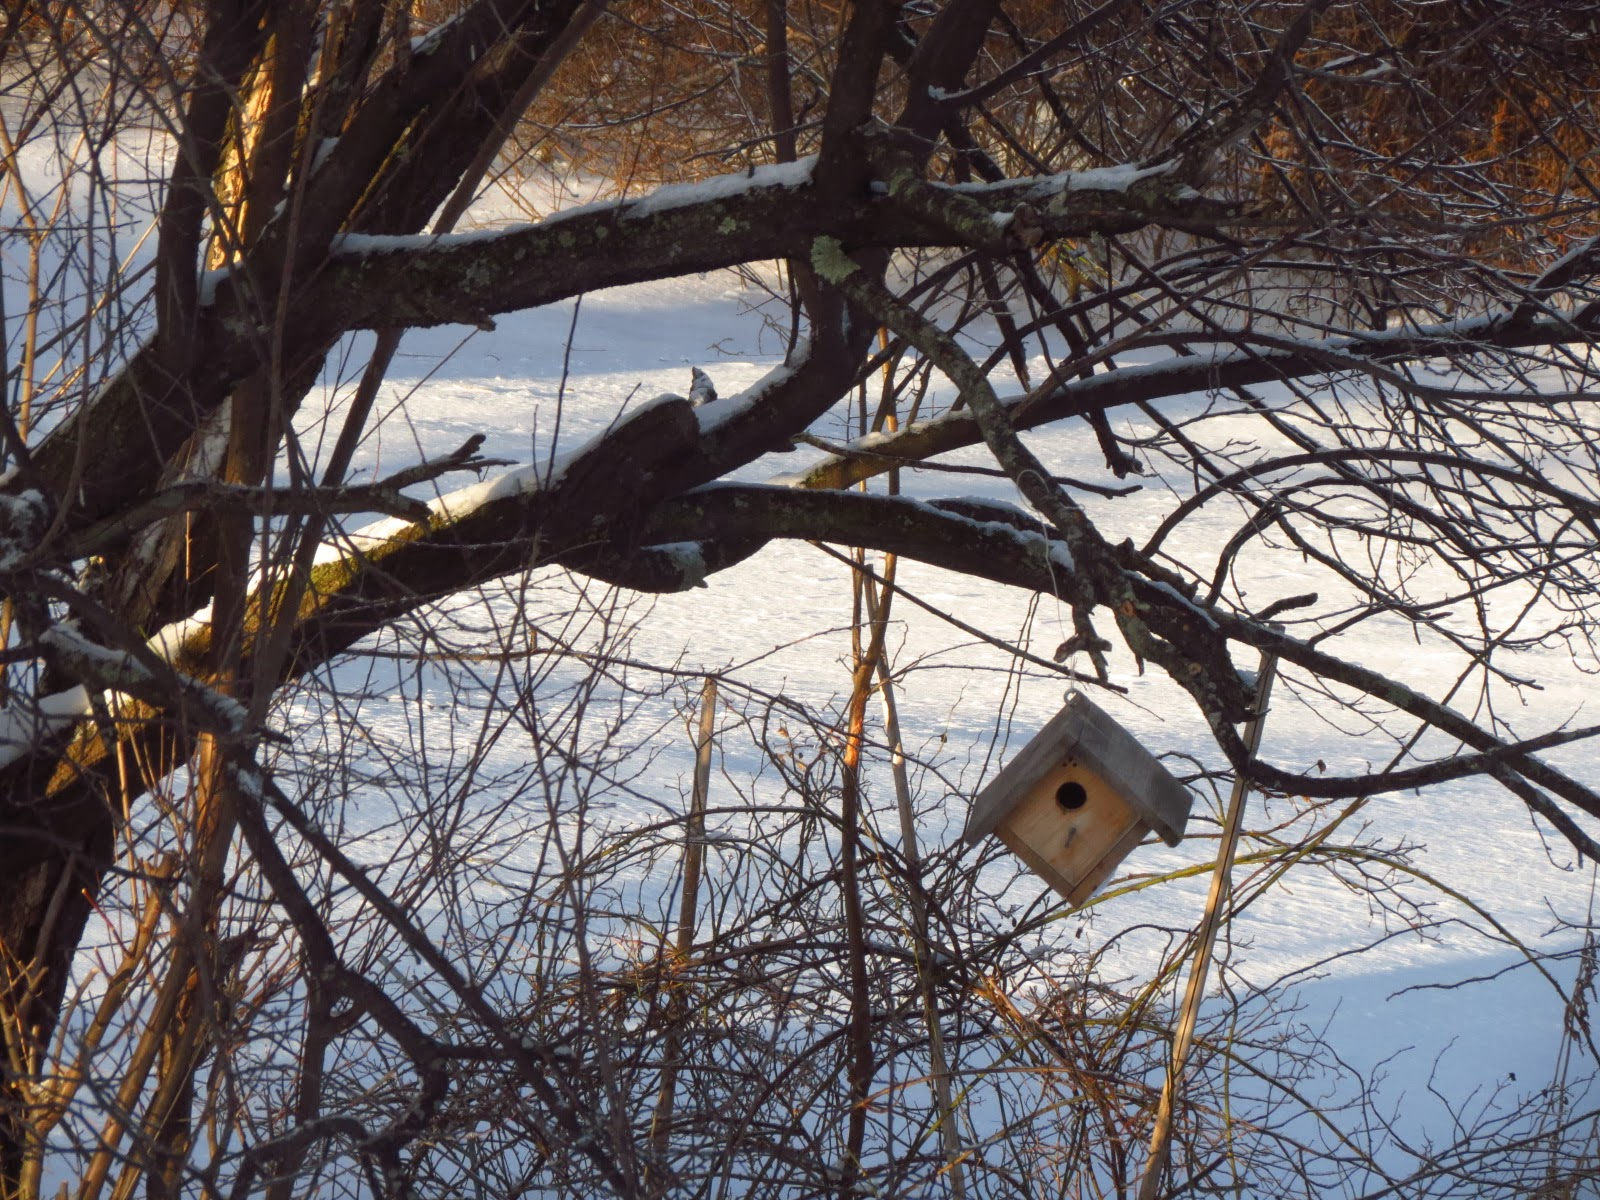 my favorite birdhouse